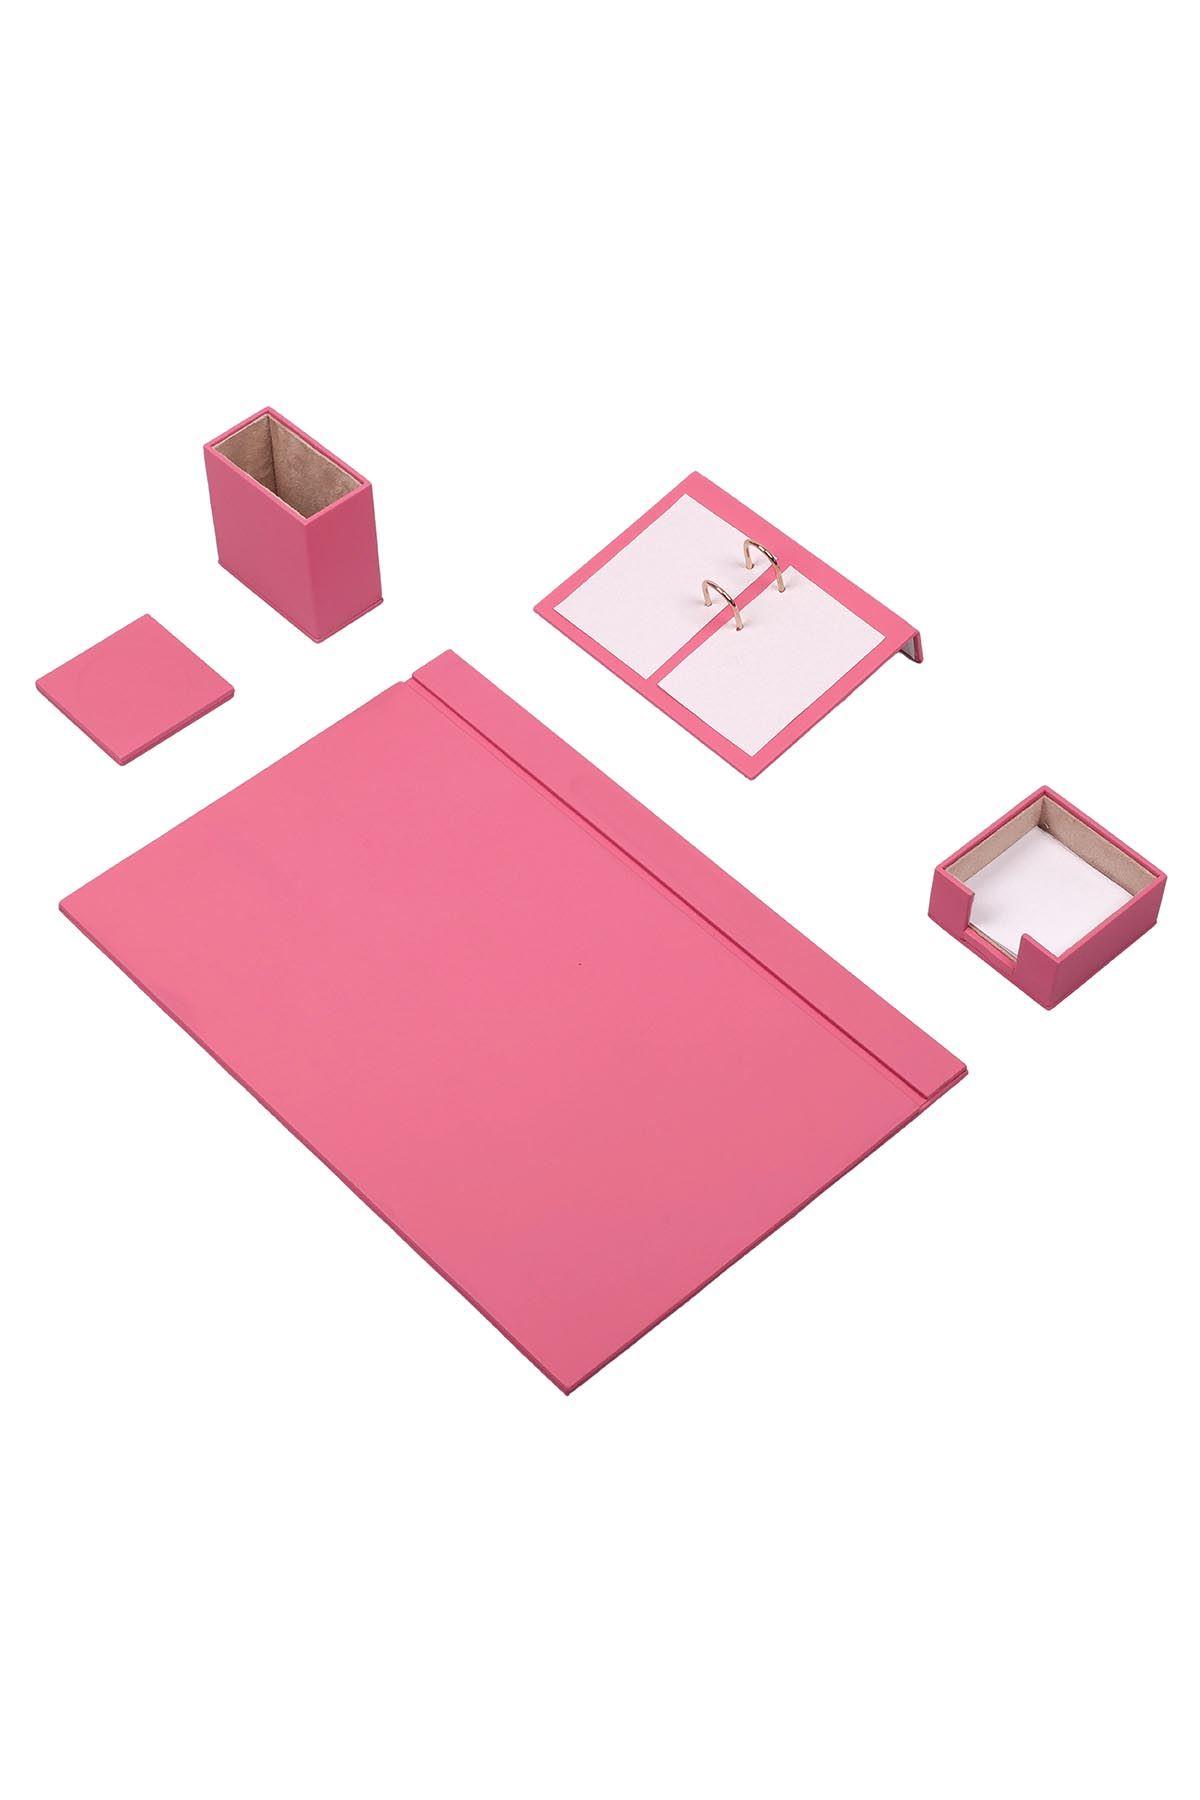 Leather Desk Set 4 Accessories Pink